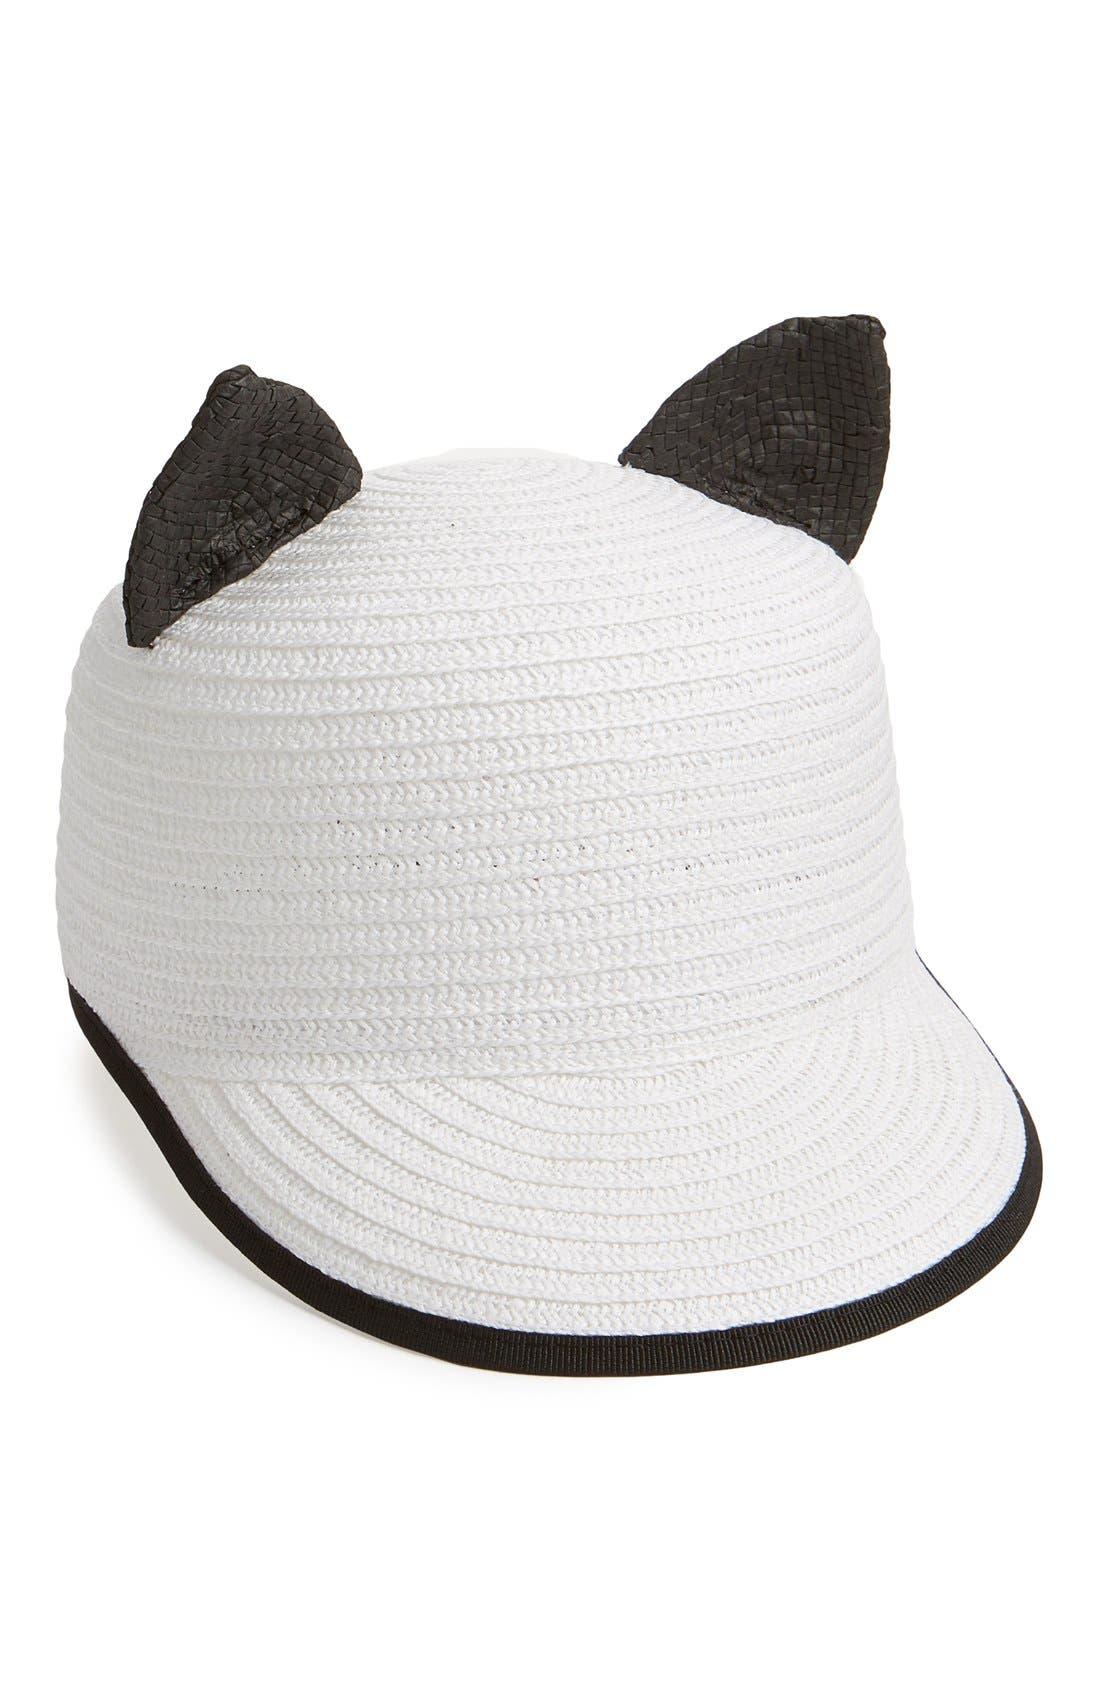 Alternate Image 1 Selected - Helene Berman 'Contrast Cat' Baseball Cap